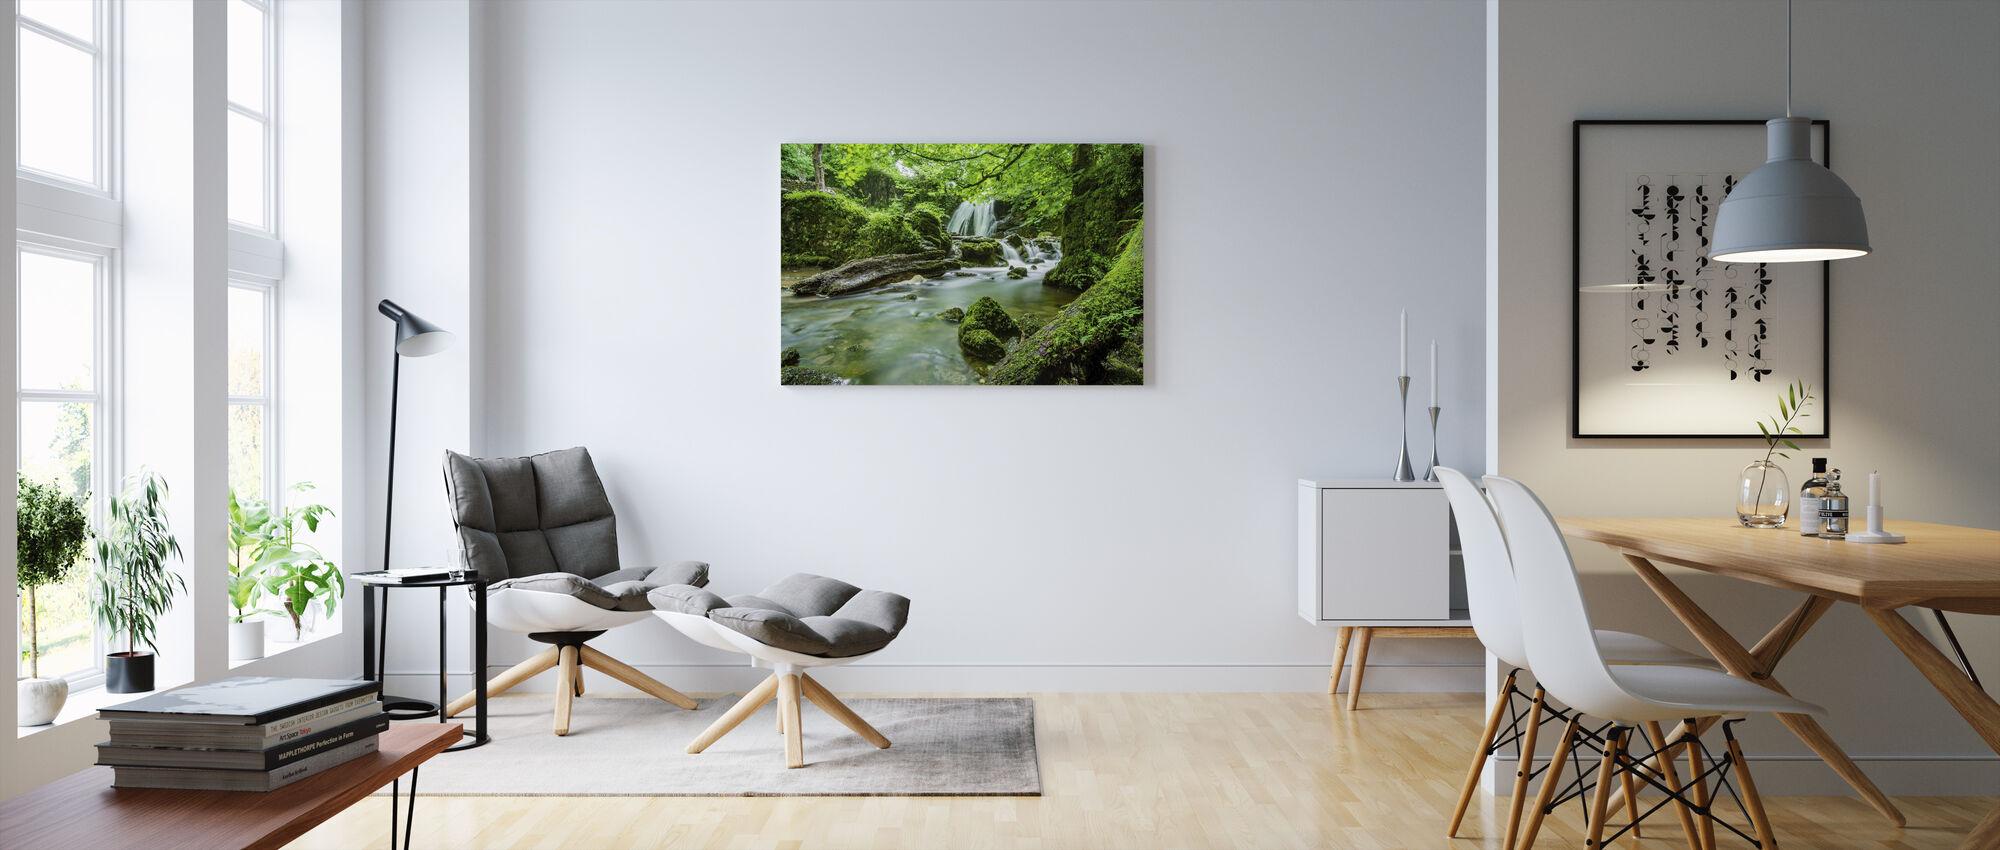 Vattenfall Stream - Canvastavla - Vardagsrum